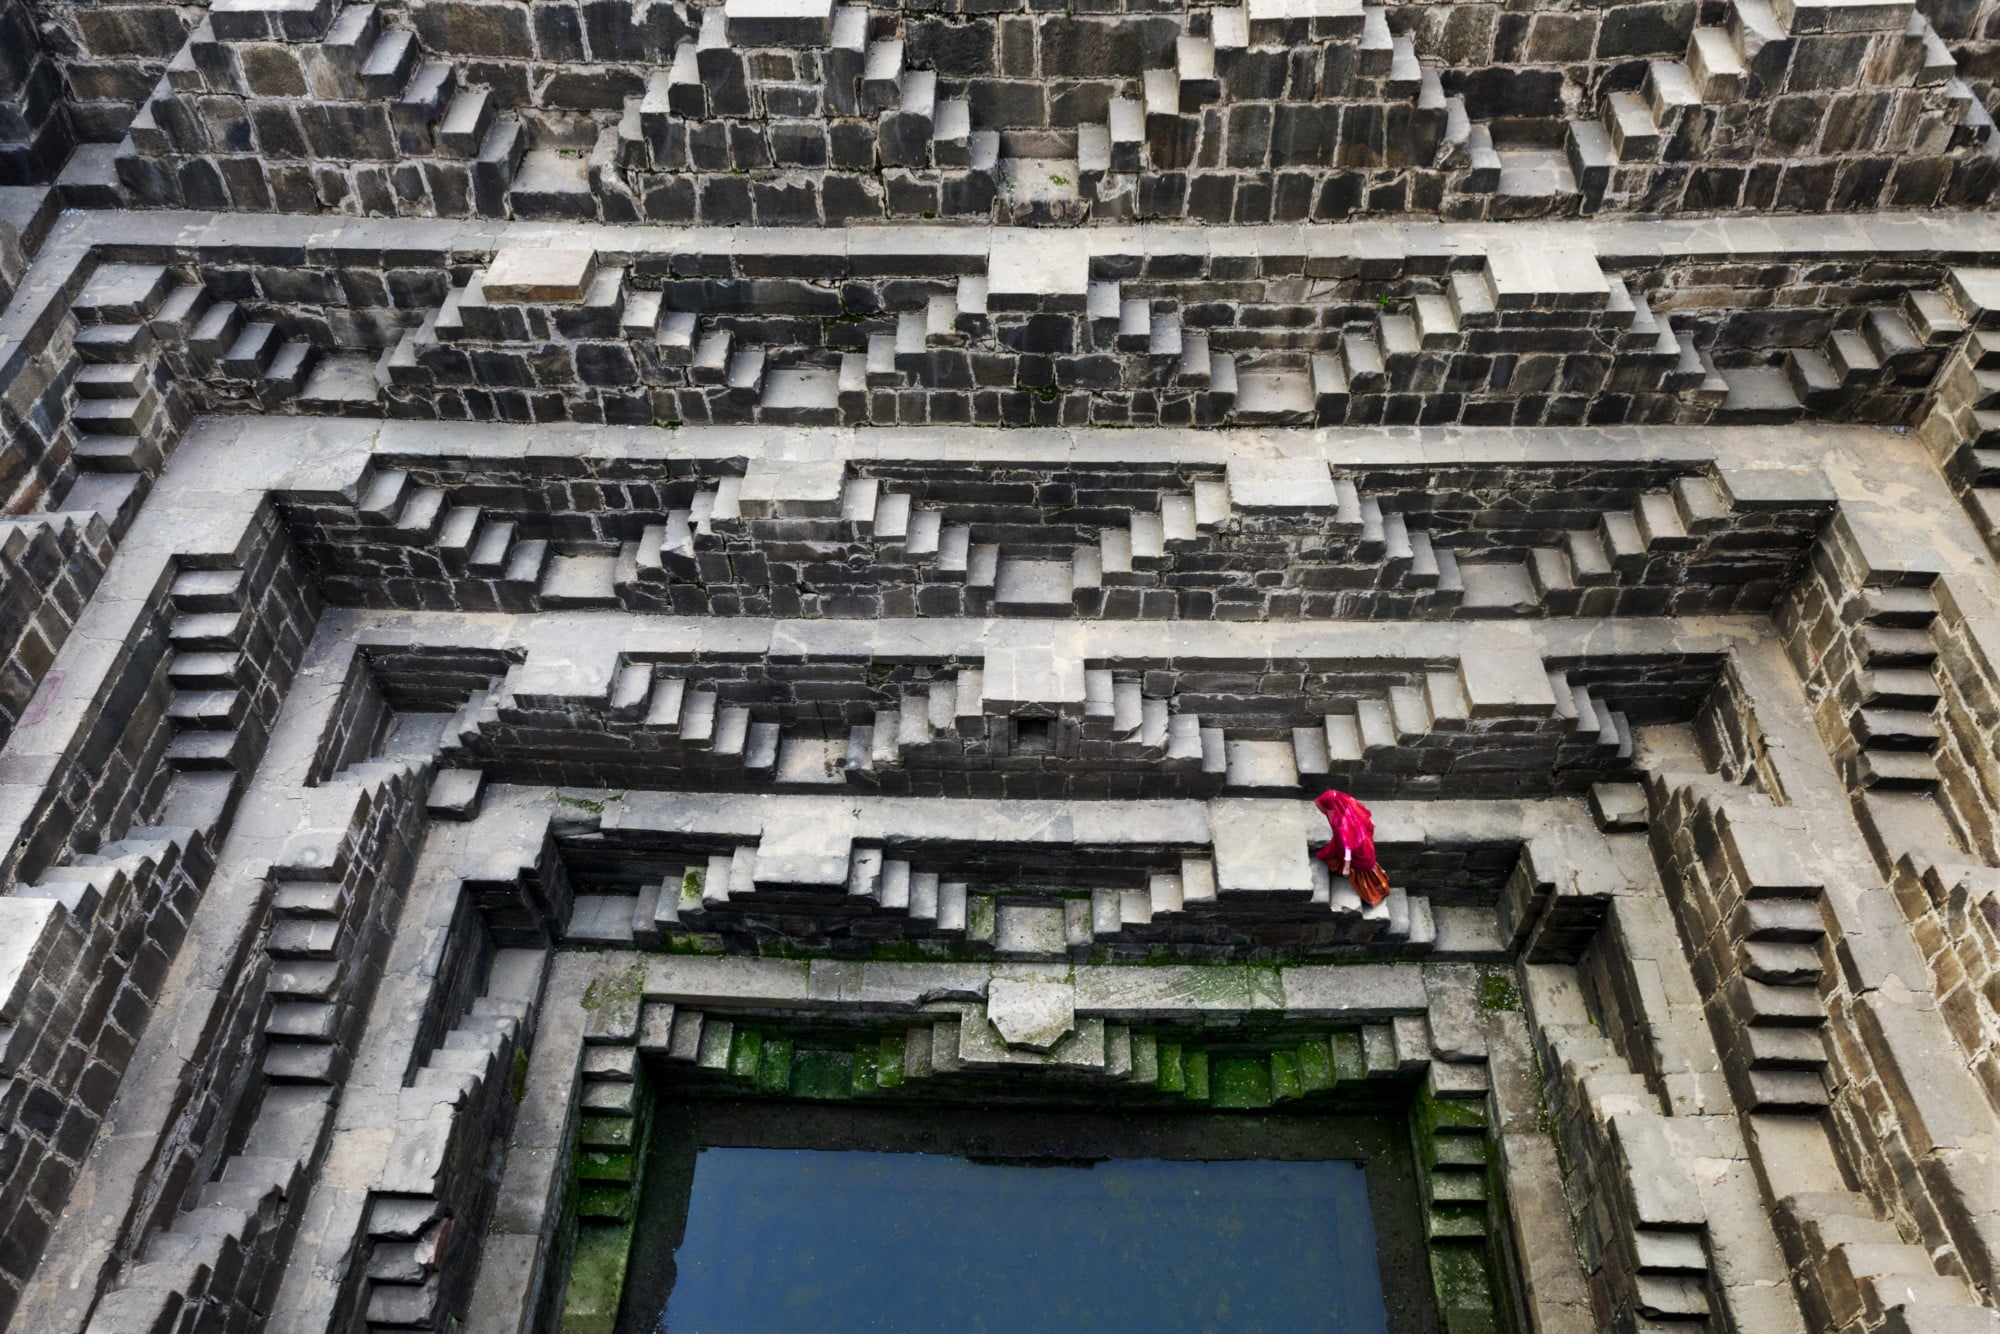 Vacheron Constantin - Steve McCurry - Chand Baori India 2